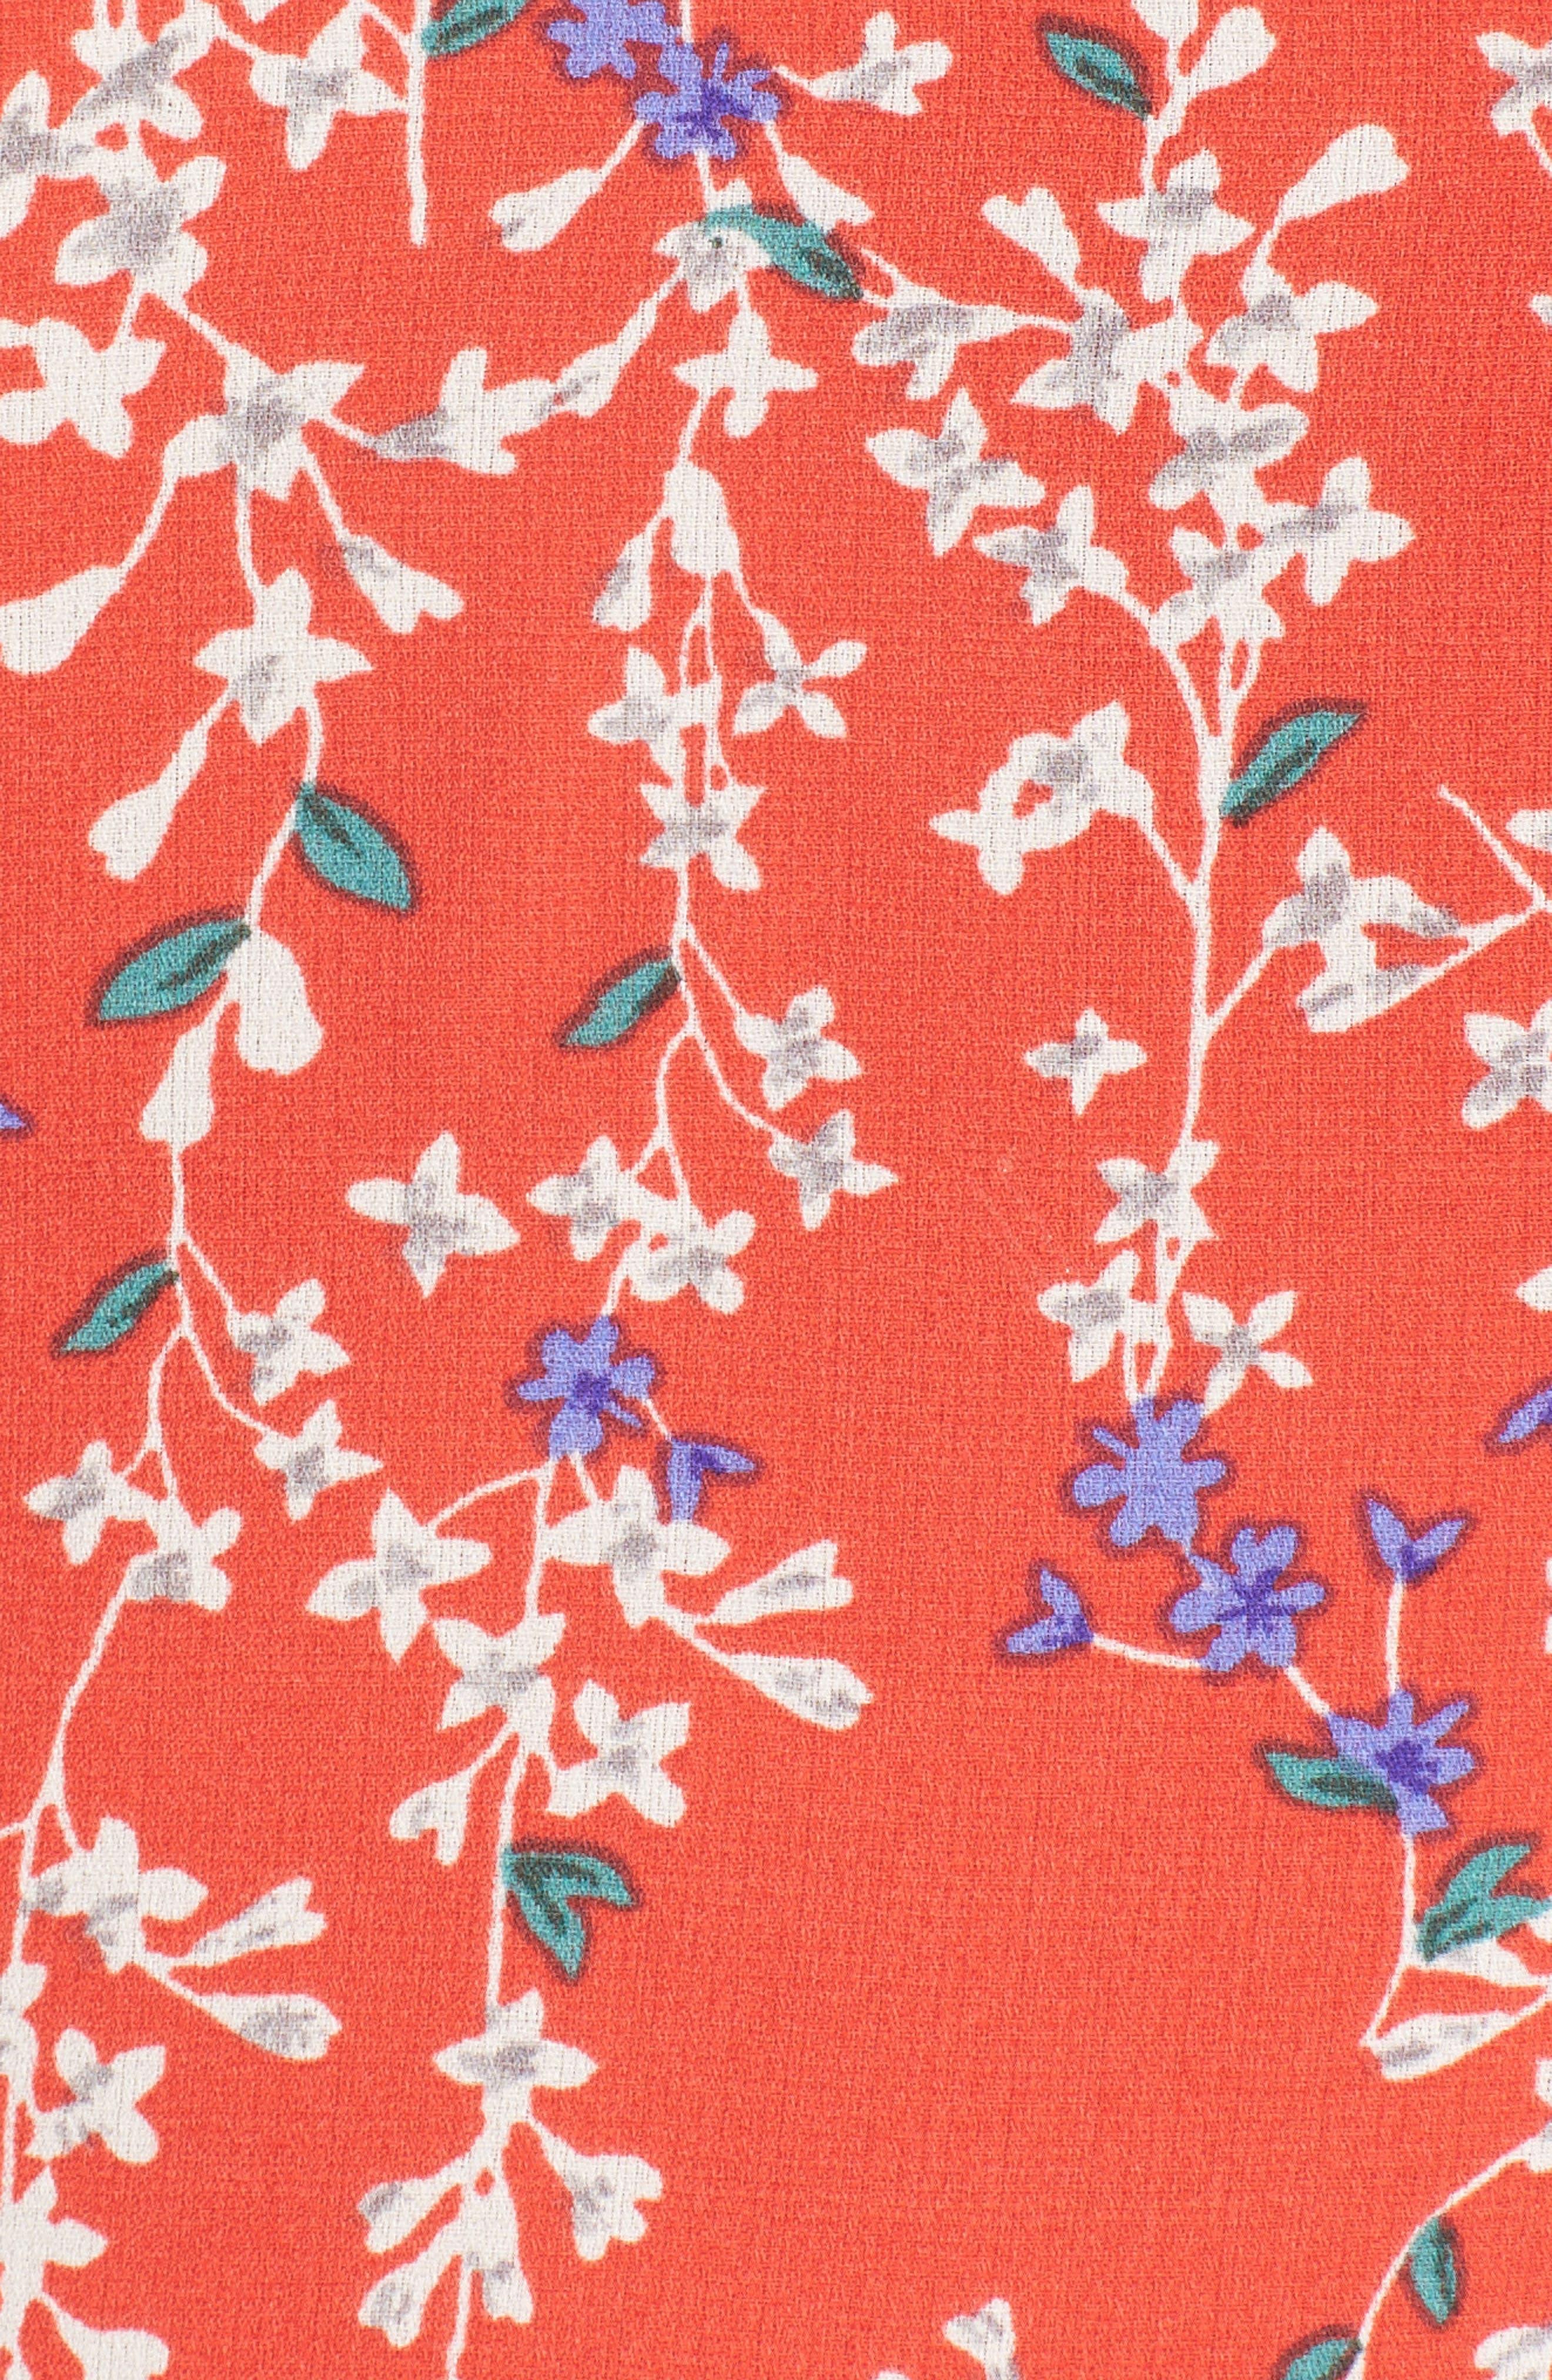 Floral Ruffle Crop Top,                             Alternate thumbnail 6, color,                             602